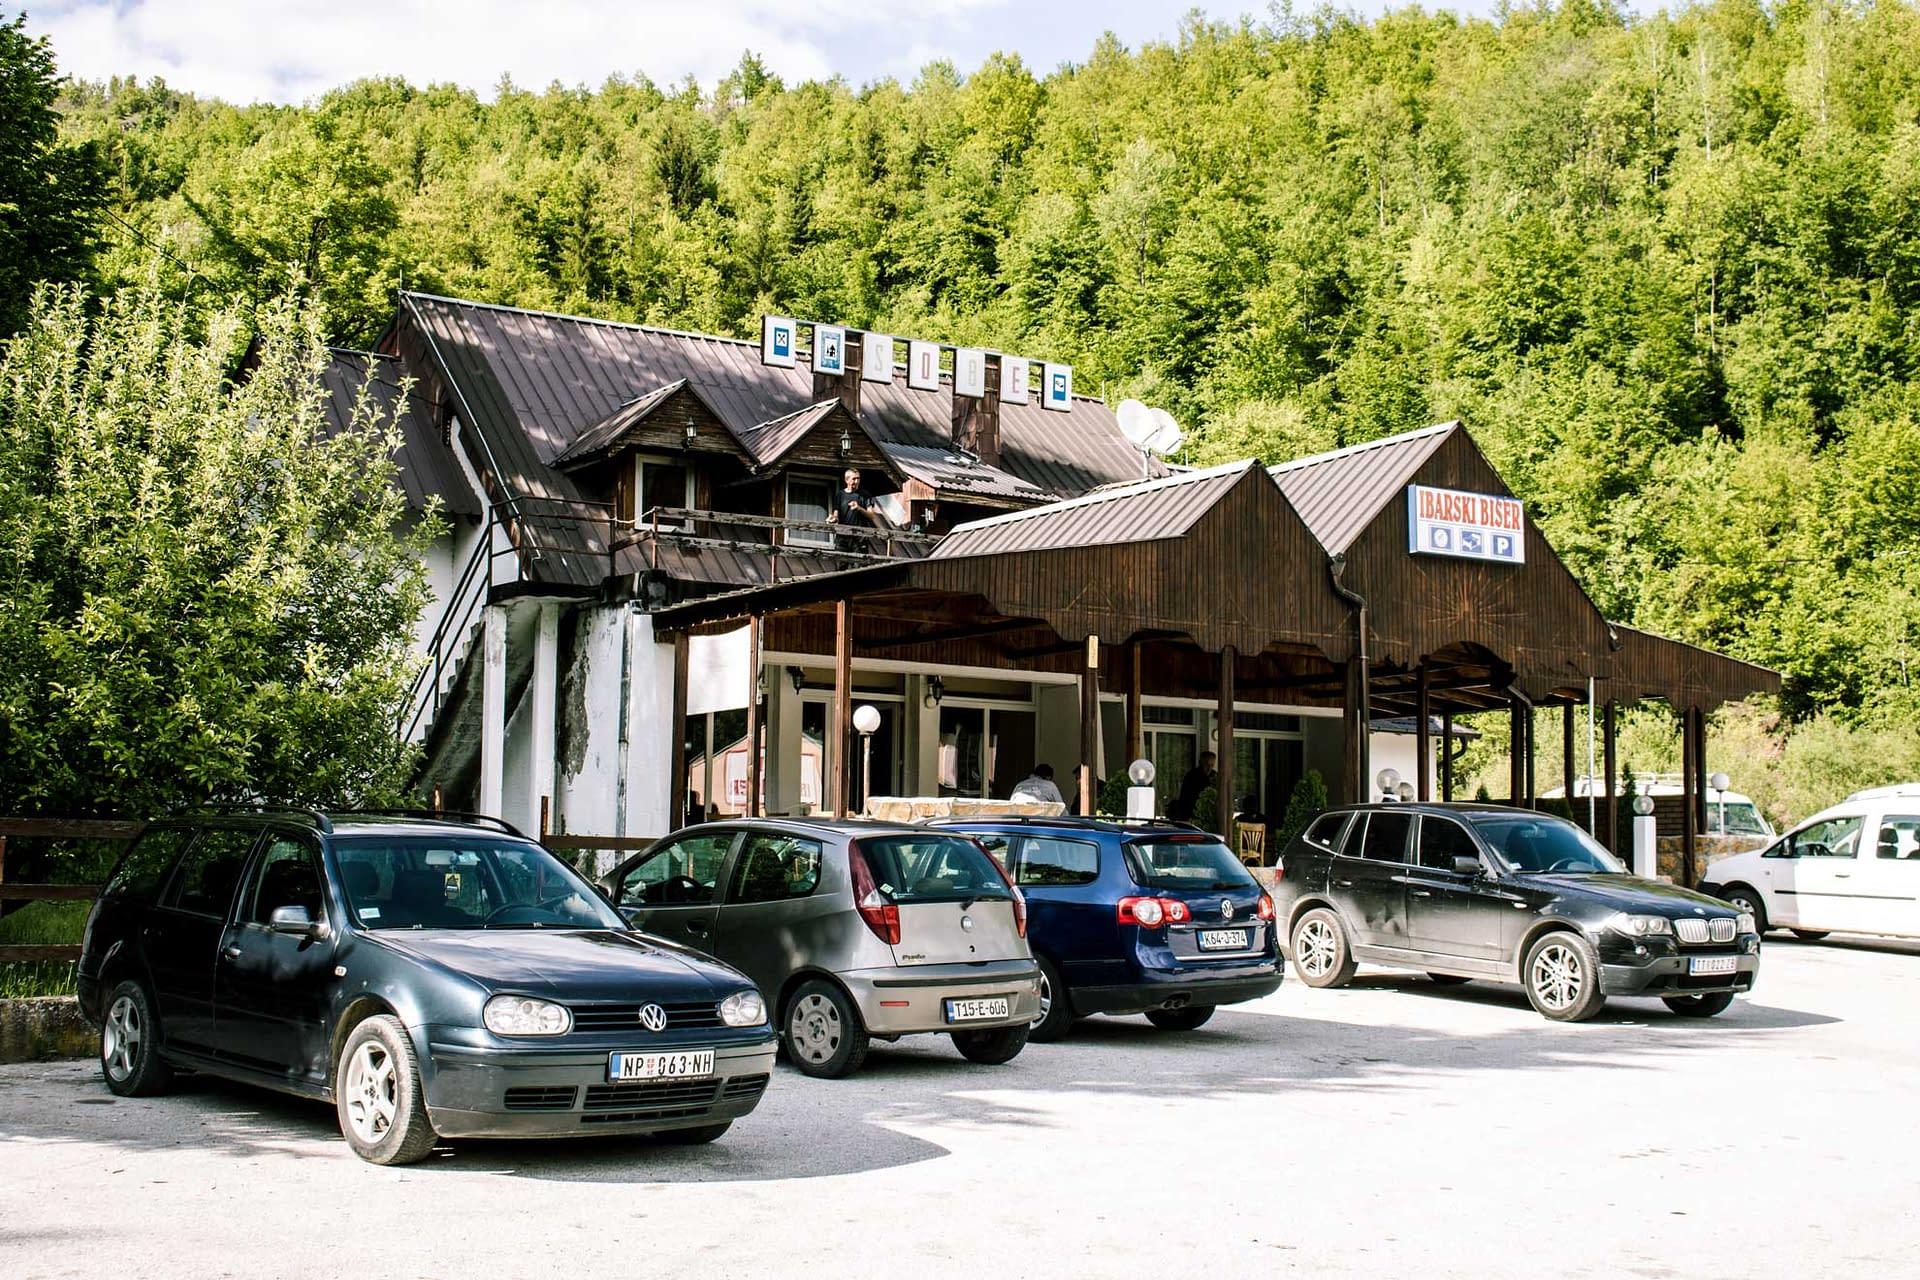 Restoran Ibarski biser